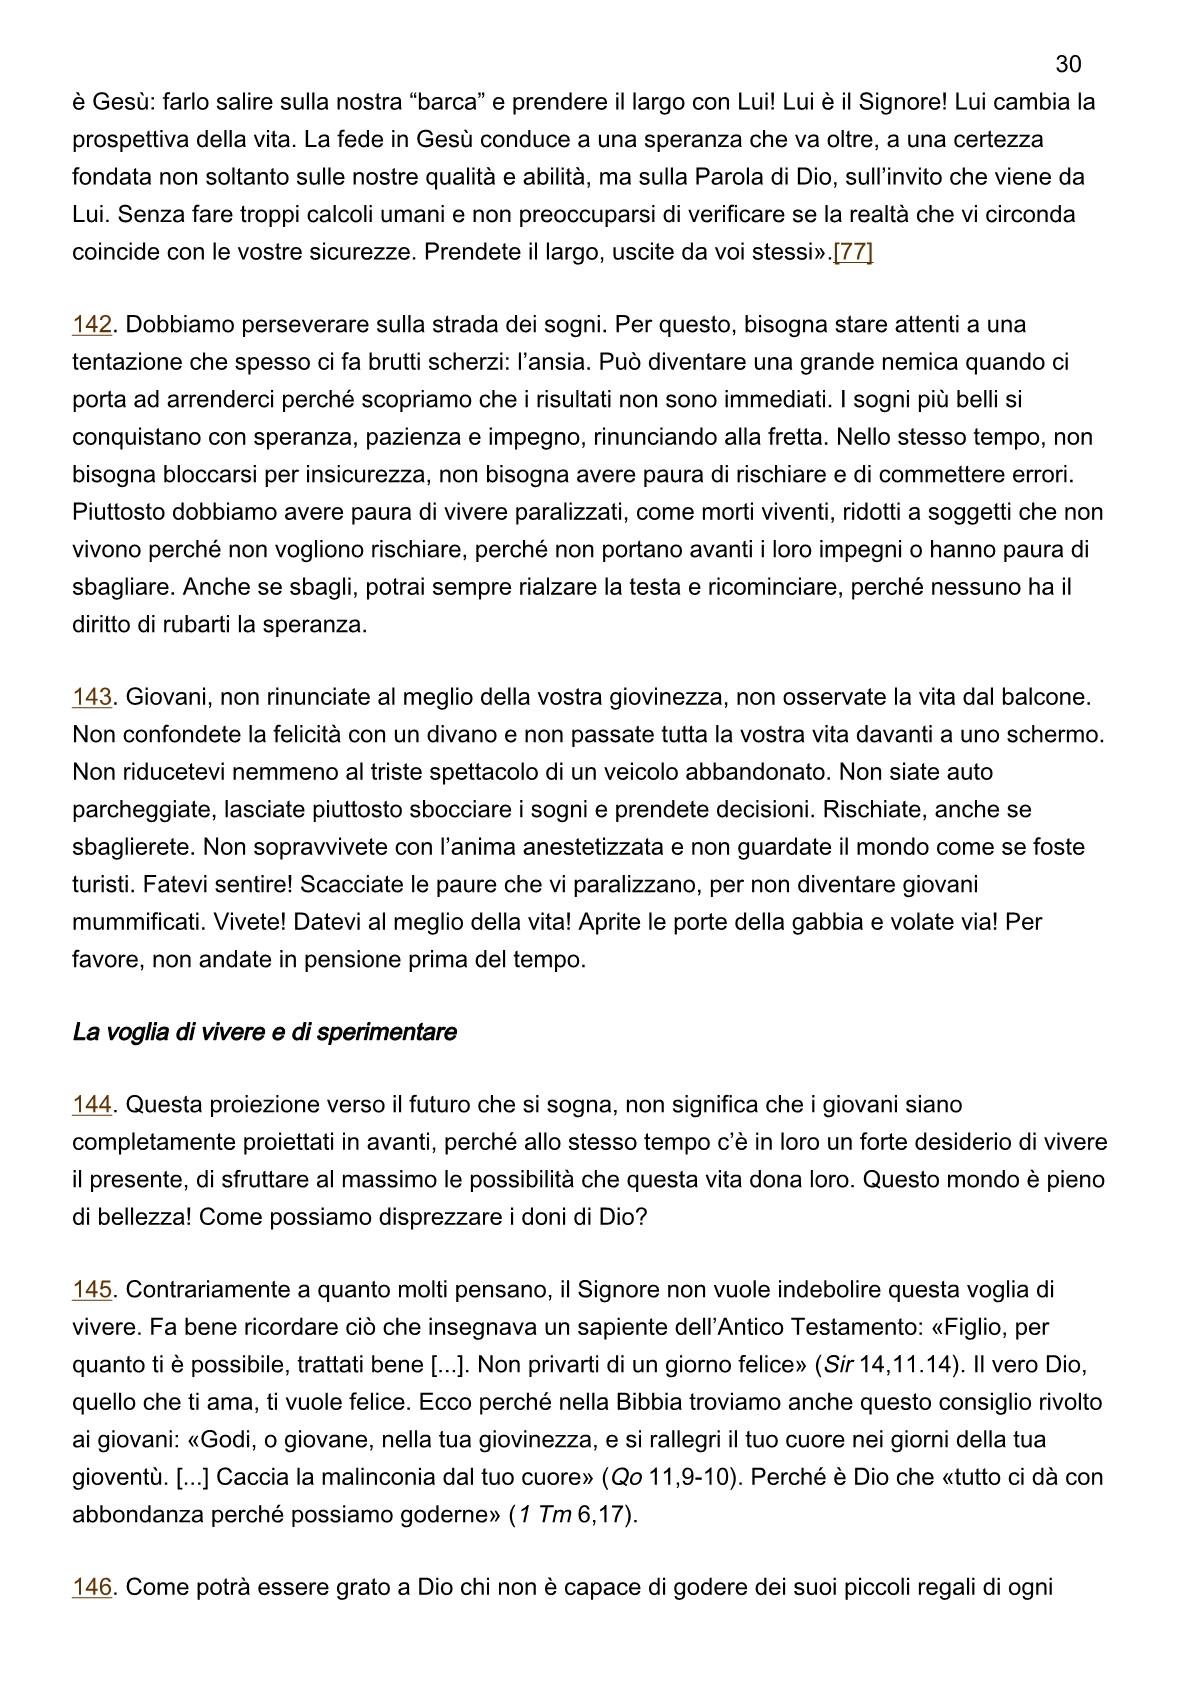 papa-francesco_esortazione-ap_20190325_christus-vivit30